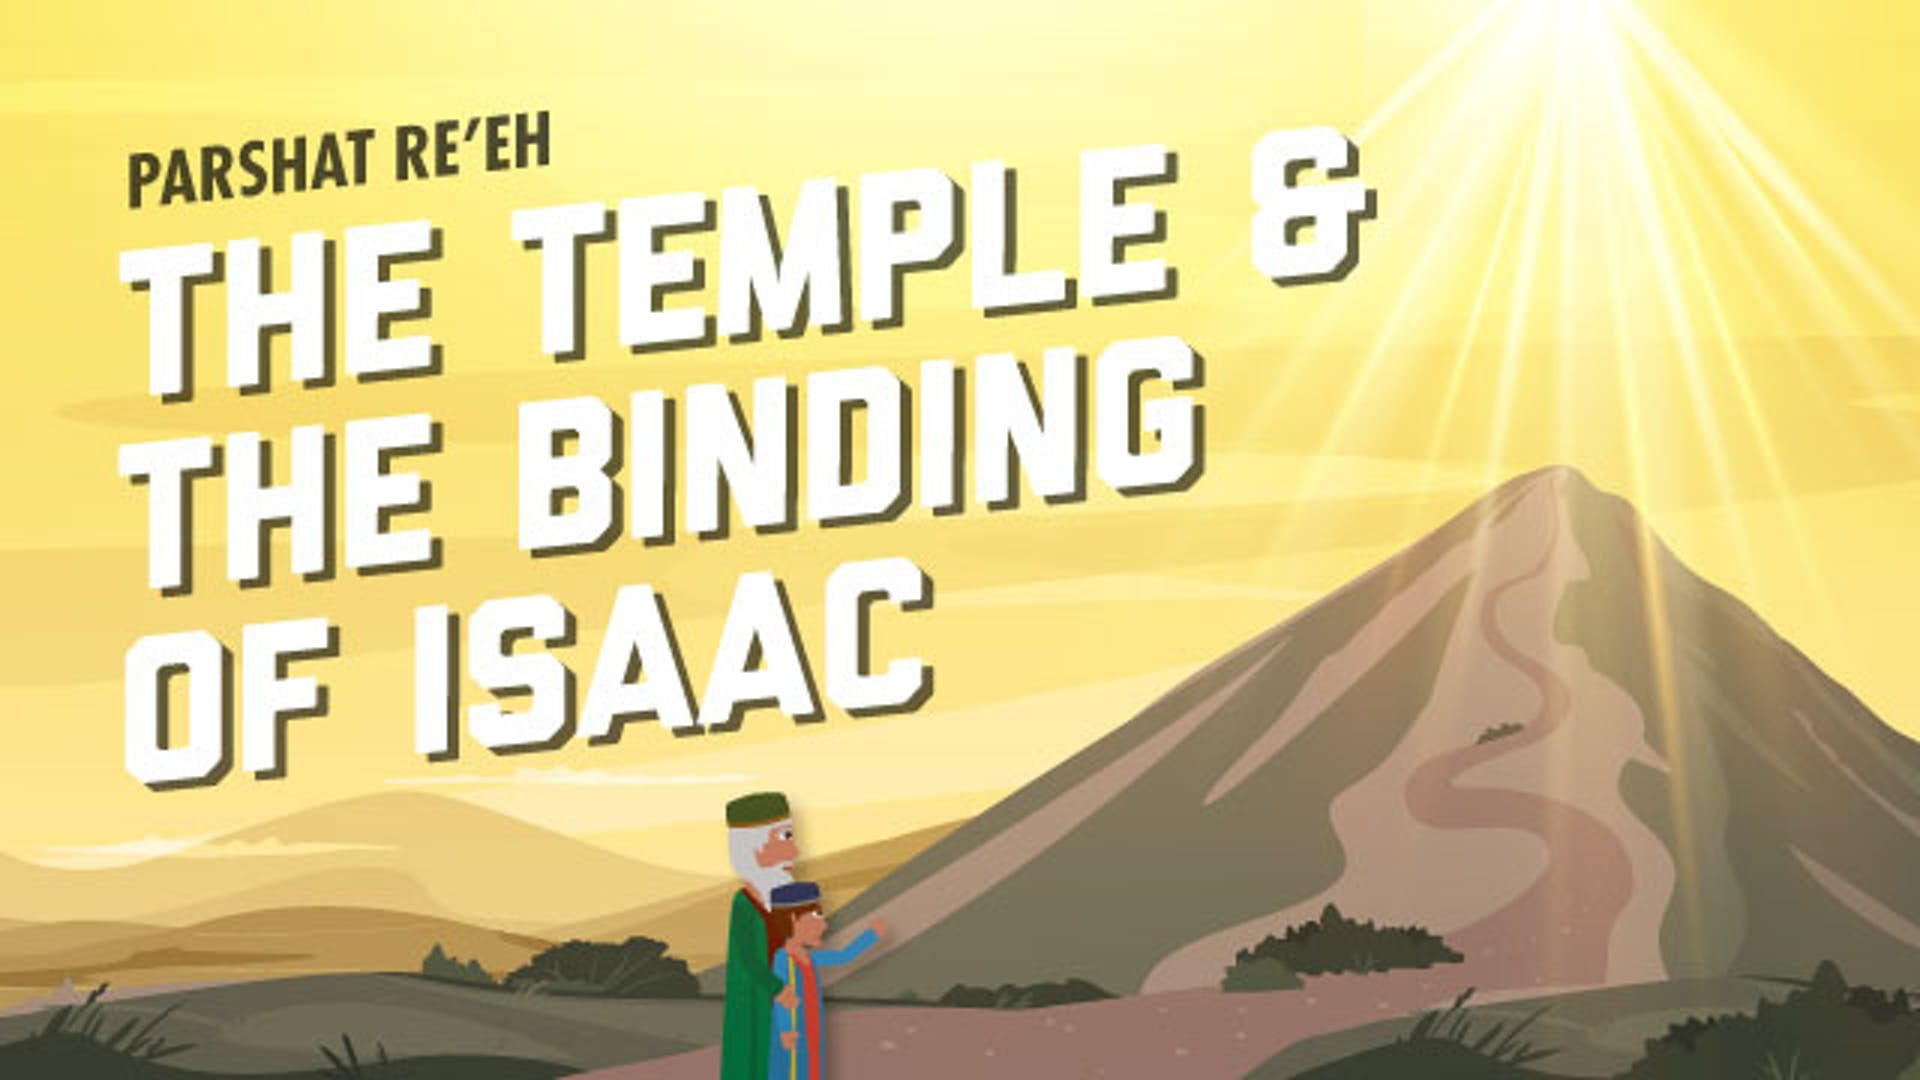 Mt Moriah Abraham Isaac Temple